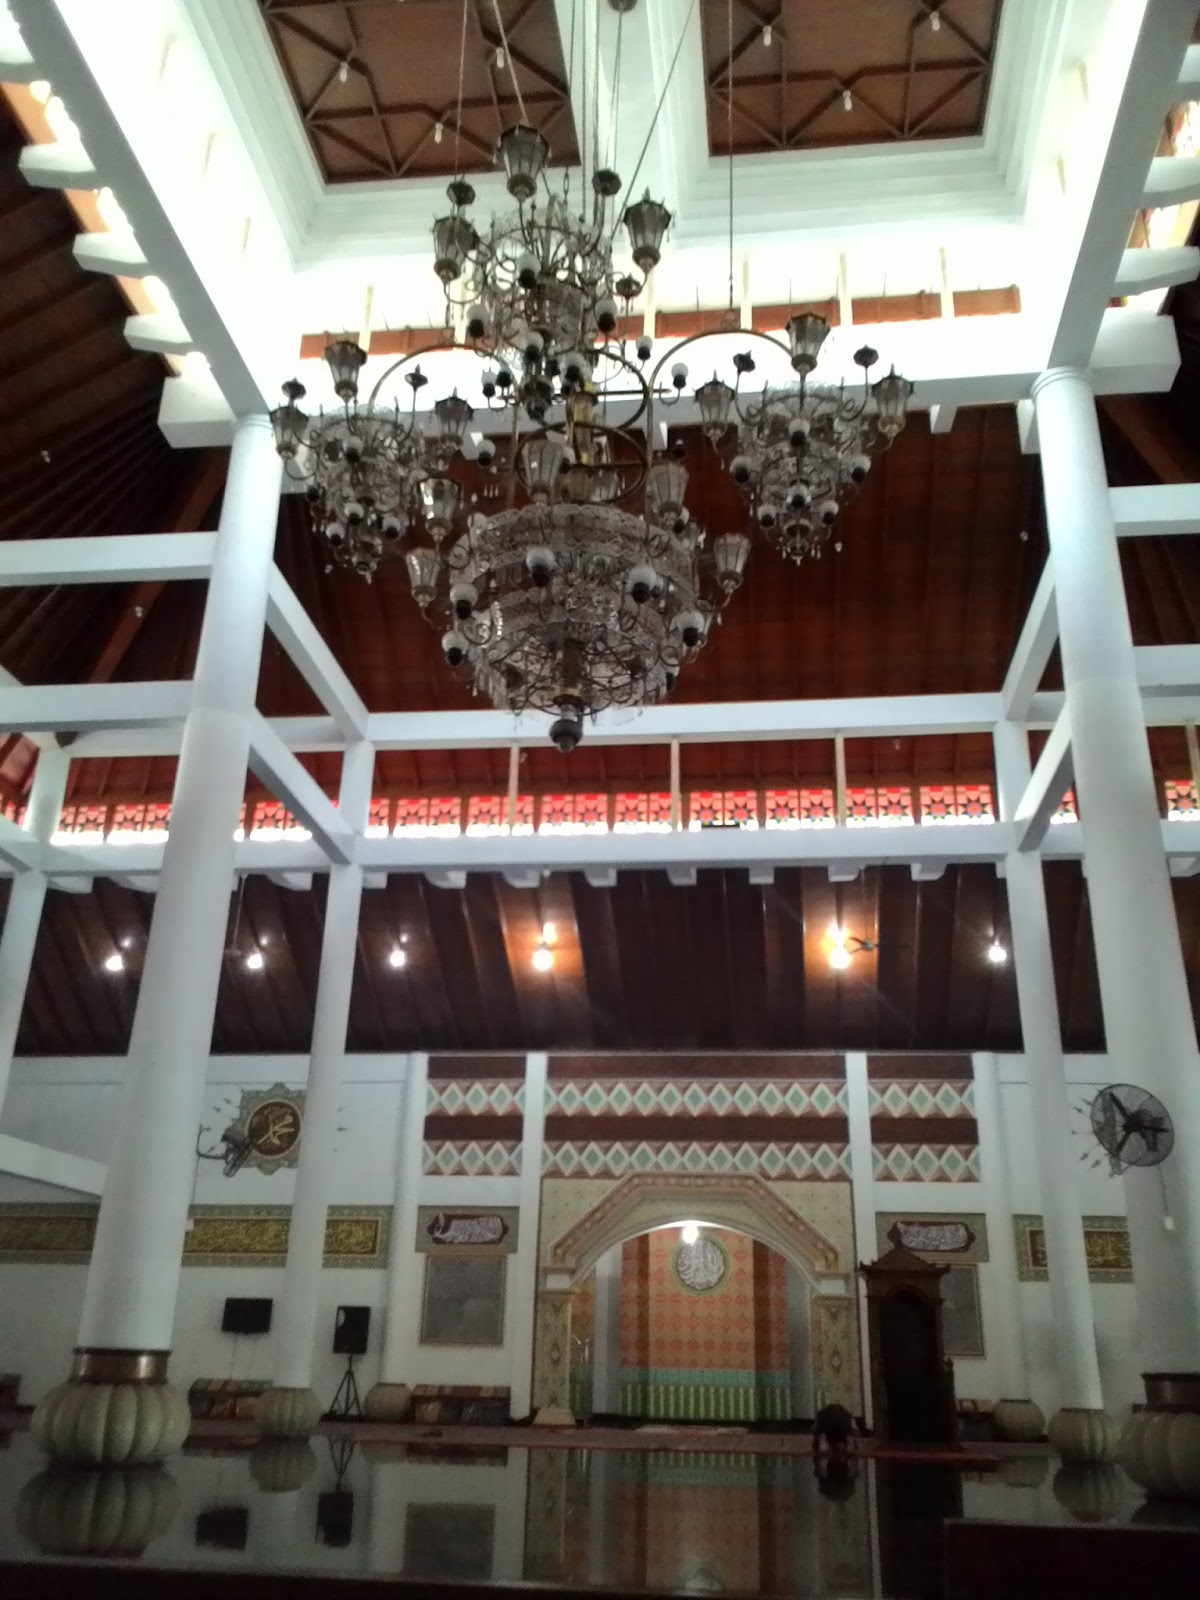 2016 Nada Diary Dokumen Pribadi Keadaan Masjid Agung Kota Serang